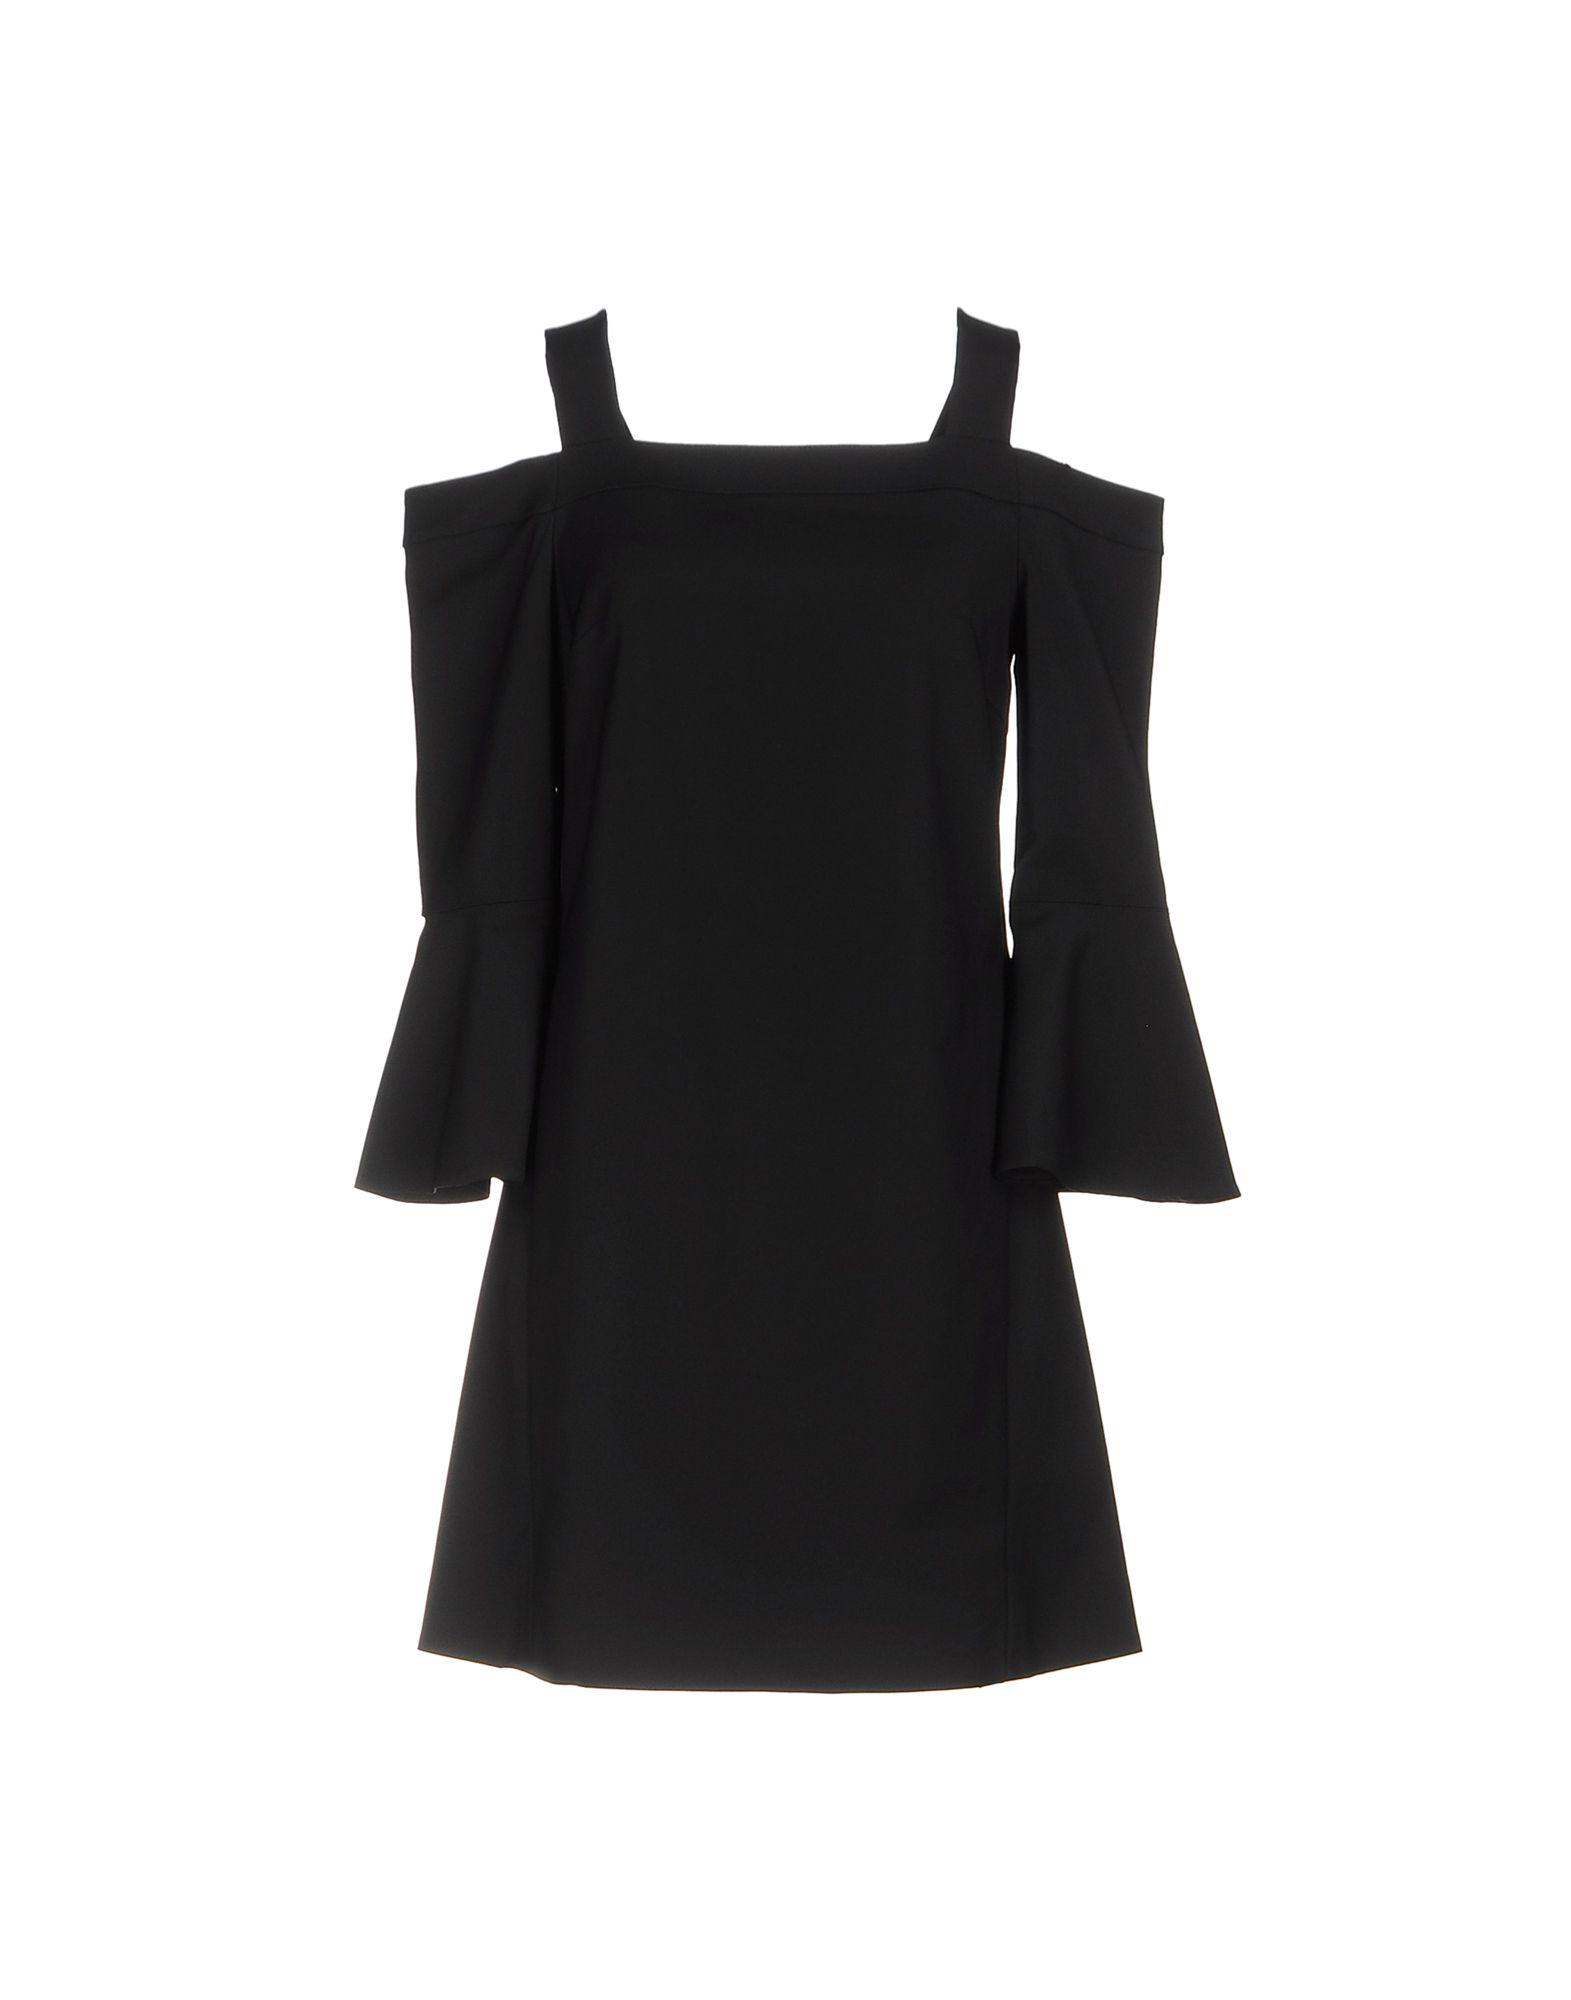 TIBI Короткое платье original new arrival 2018 adidas neo label m cs sweatshirt men s pullover jerseys sportswear